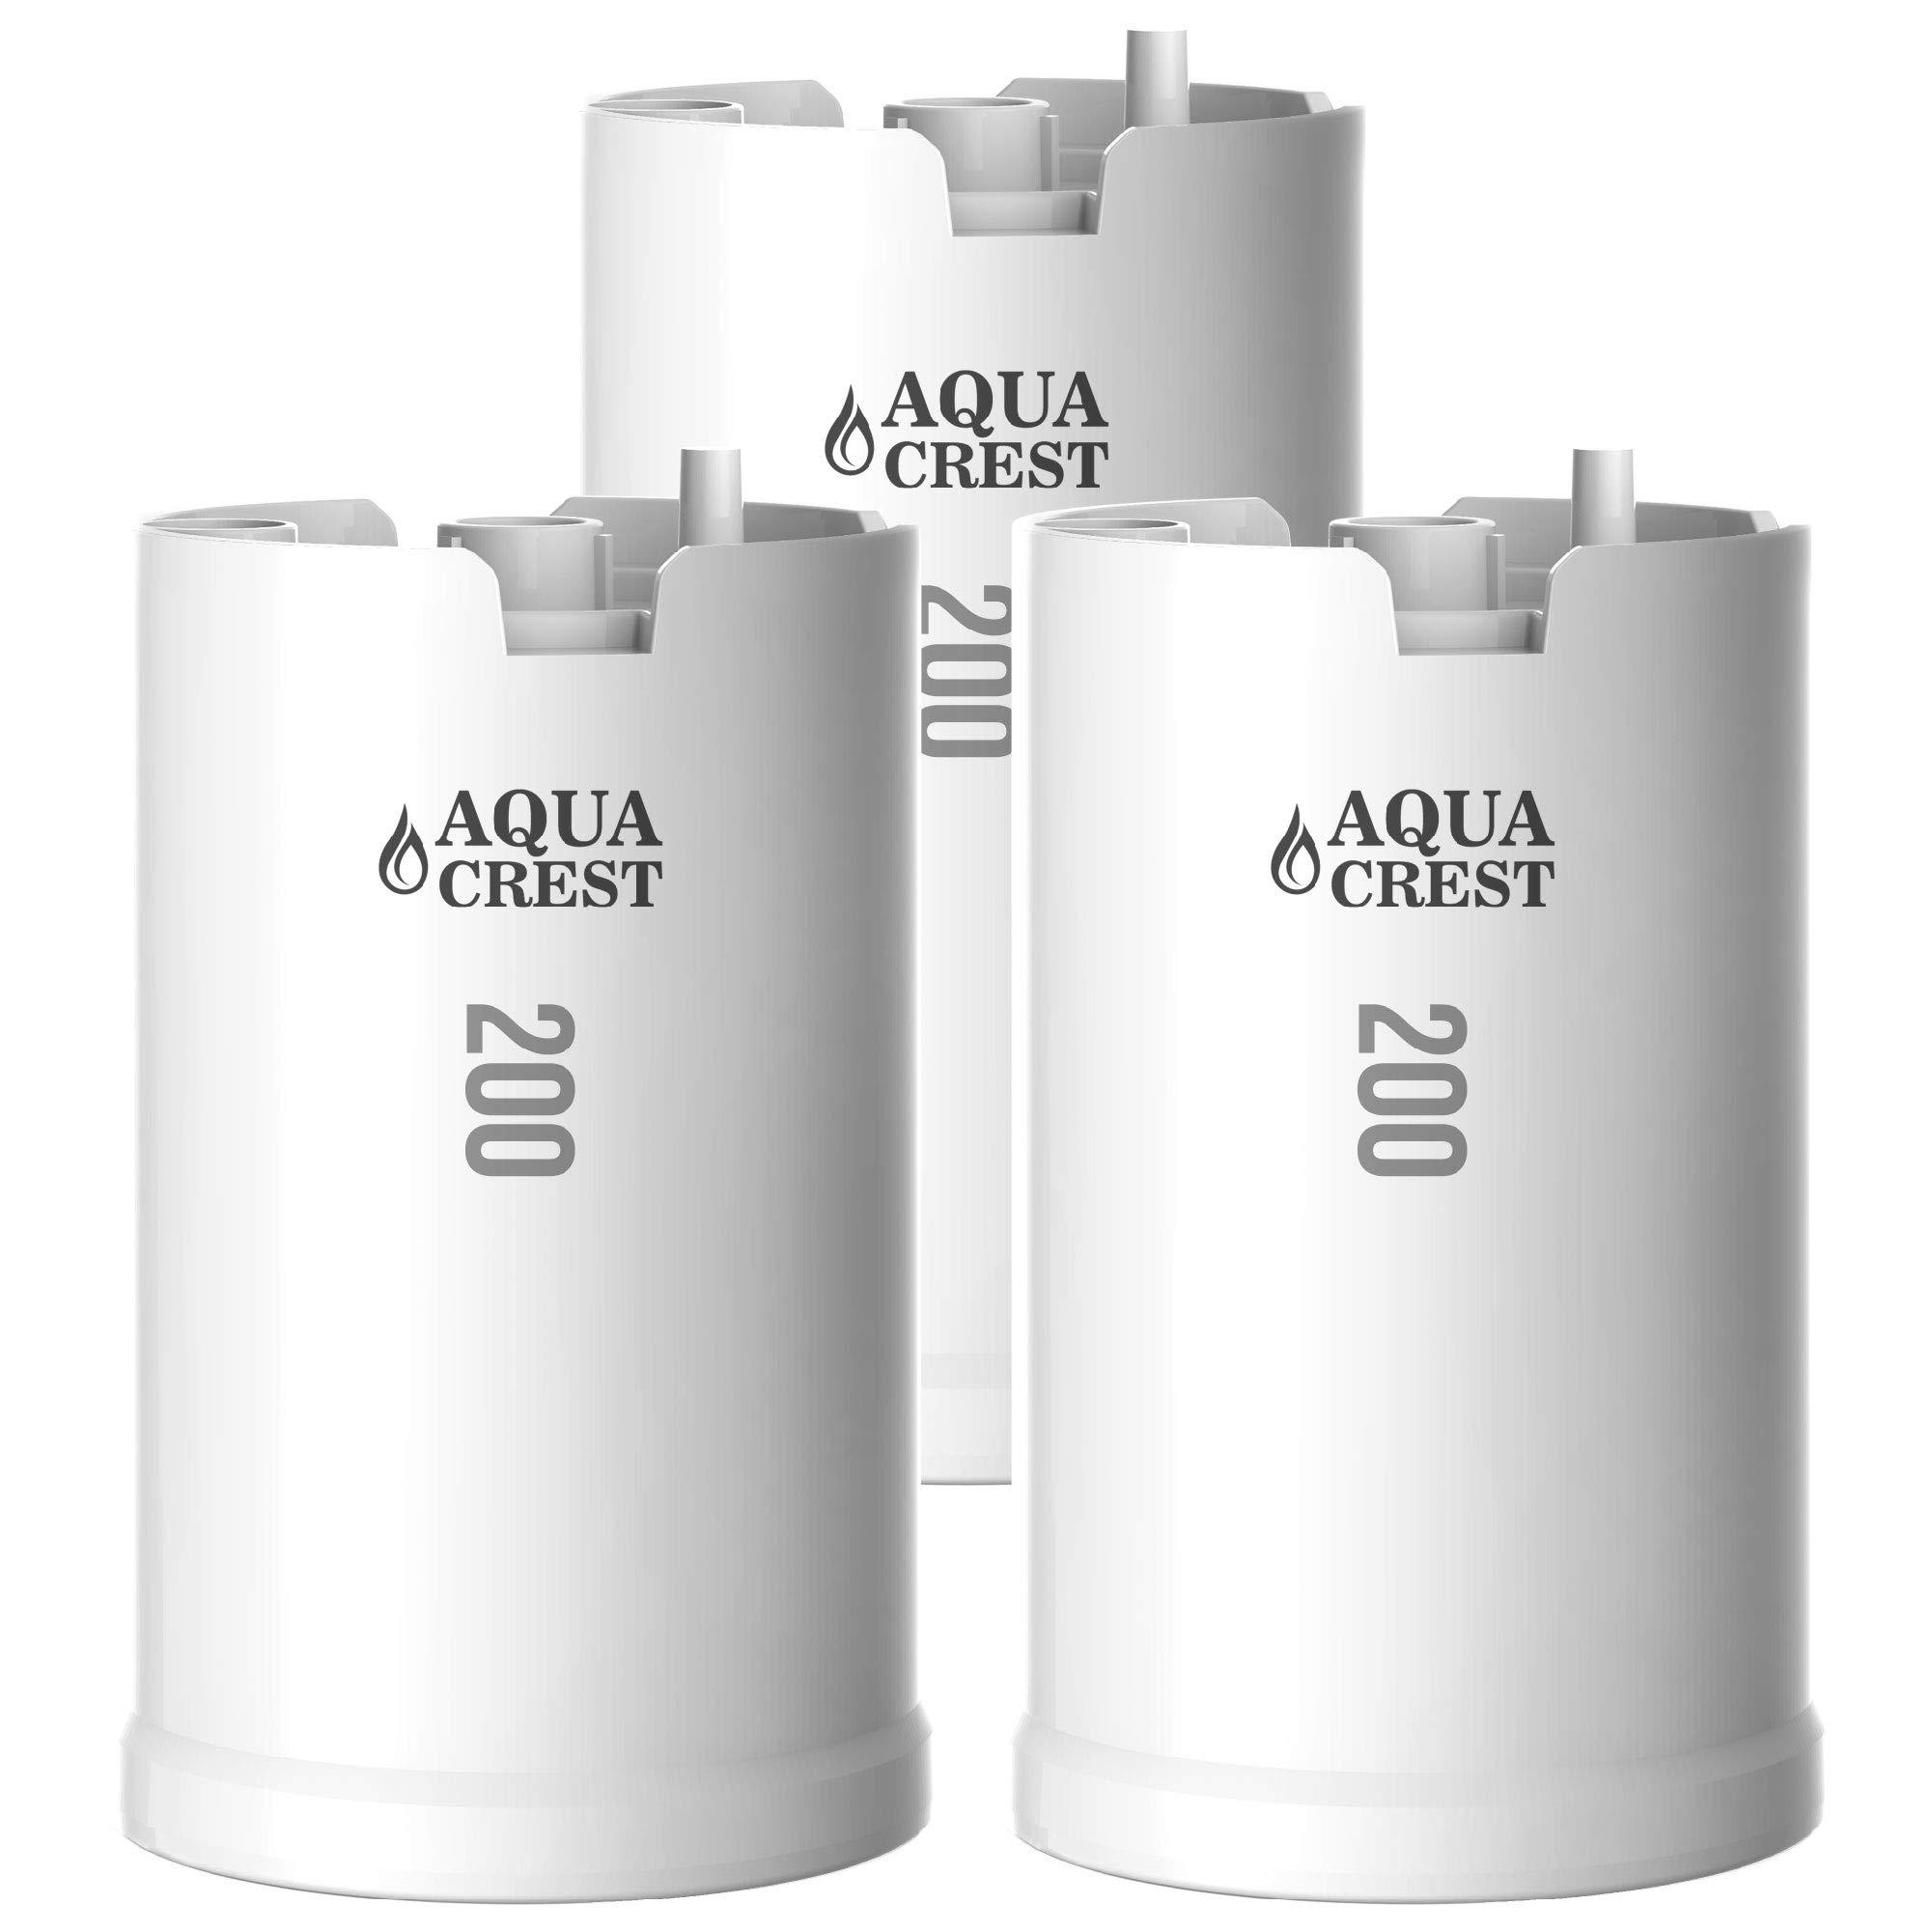 AQUACREST WFFMC303X Faucet Water Filter, Compatible with DuPont FMC303X, WFFMC300X Faucet Mount Water Filtration Cartridge, 200-Gallon (Pack of 3) by AQUA CREST